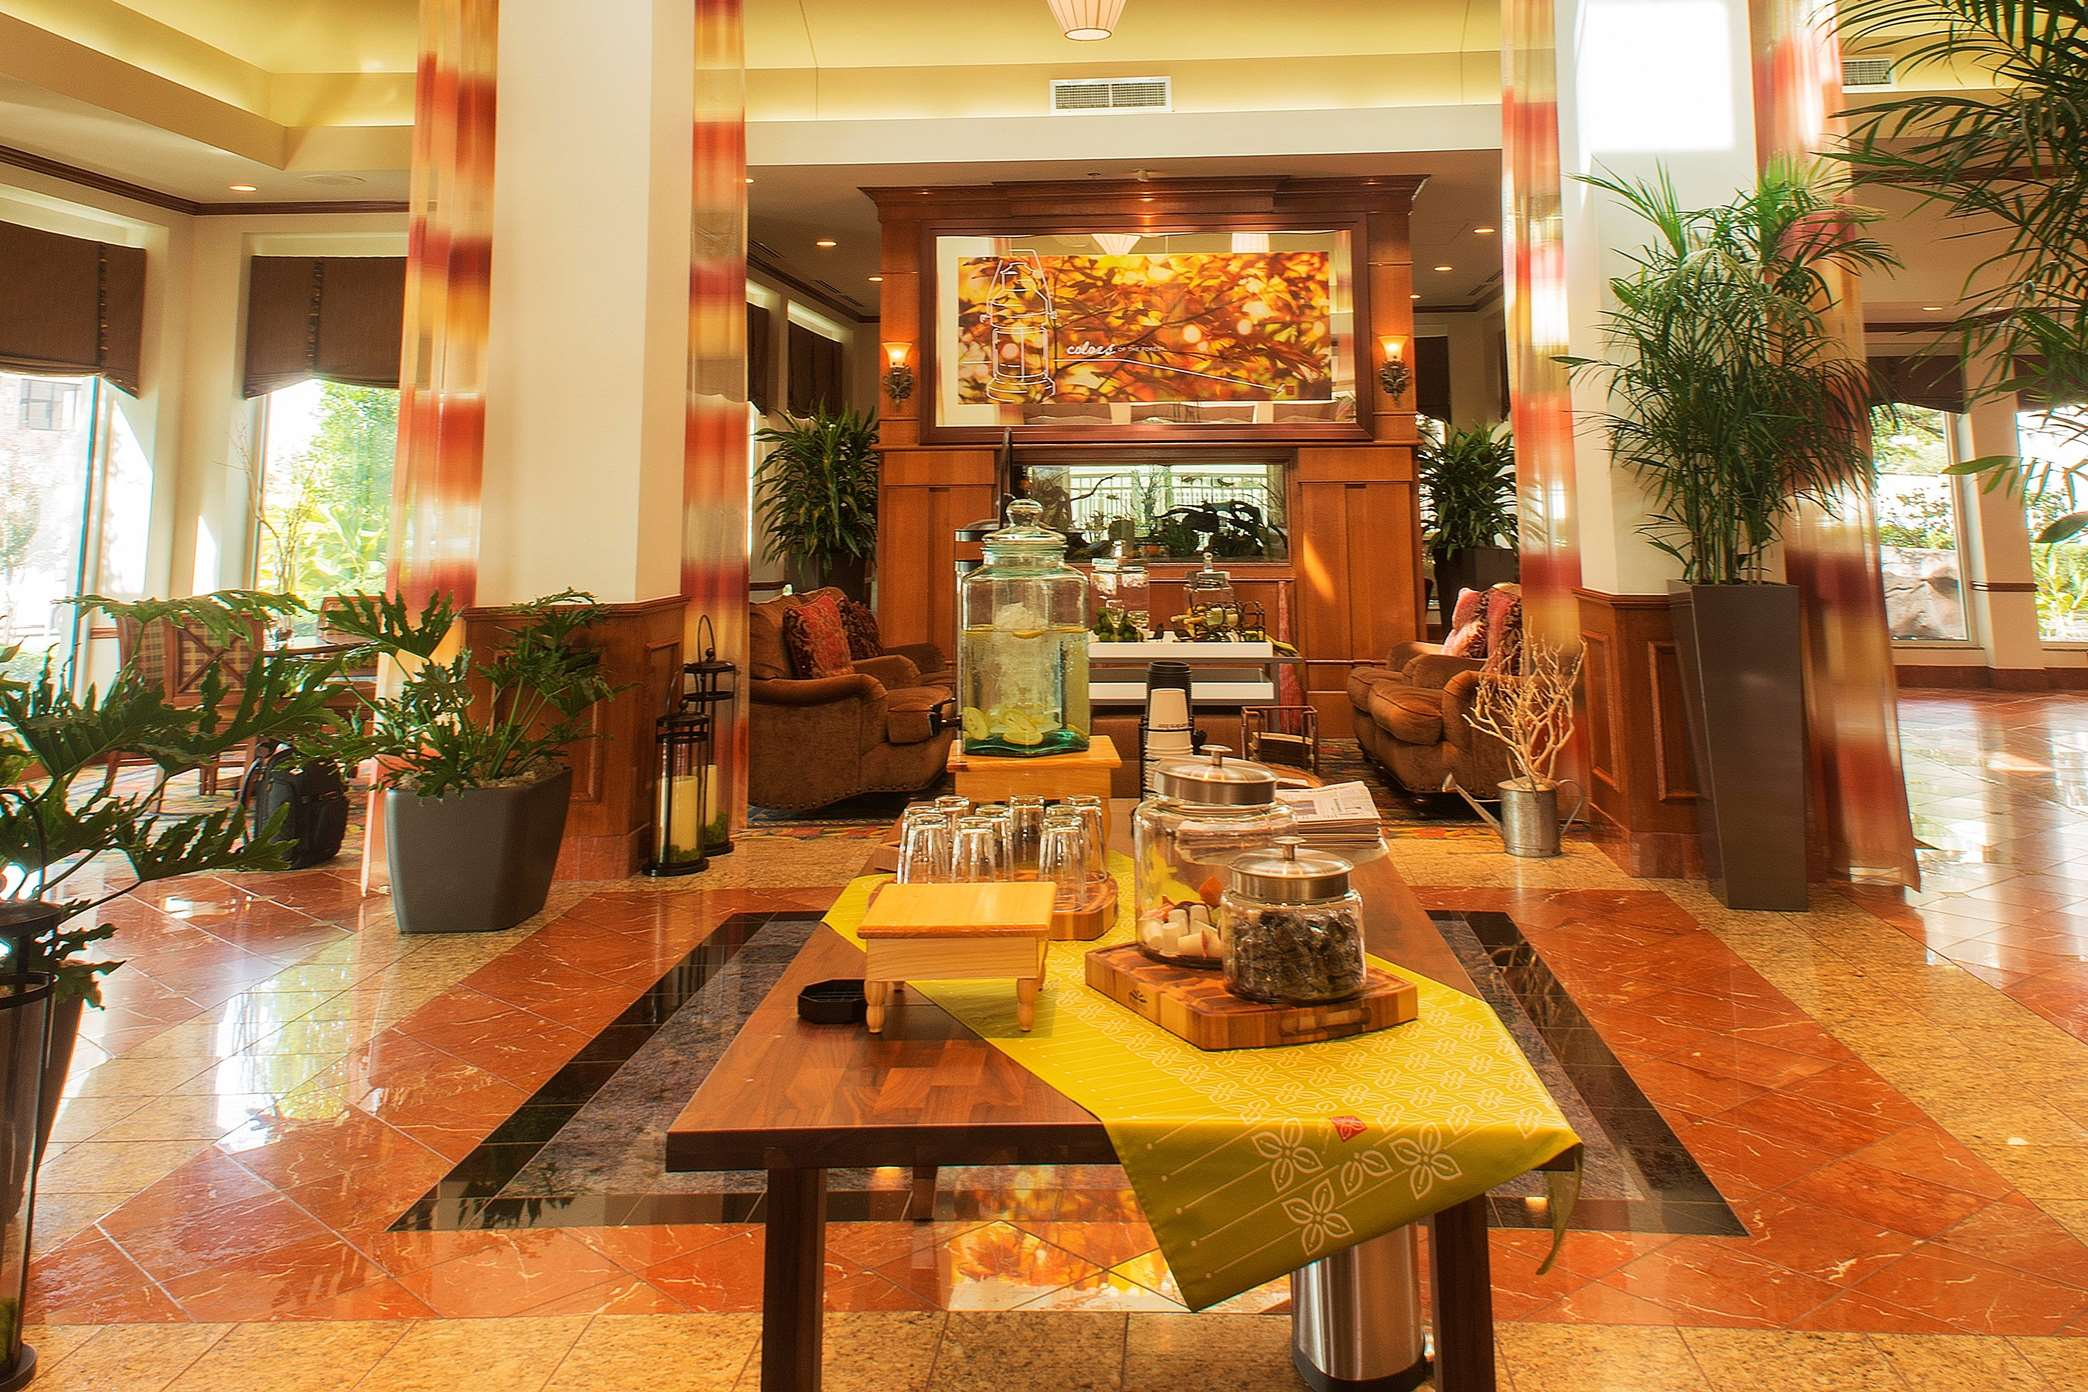 Hilton Garden Inn Houston Westbelt in Houston, TX 77072 ...